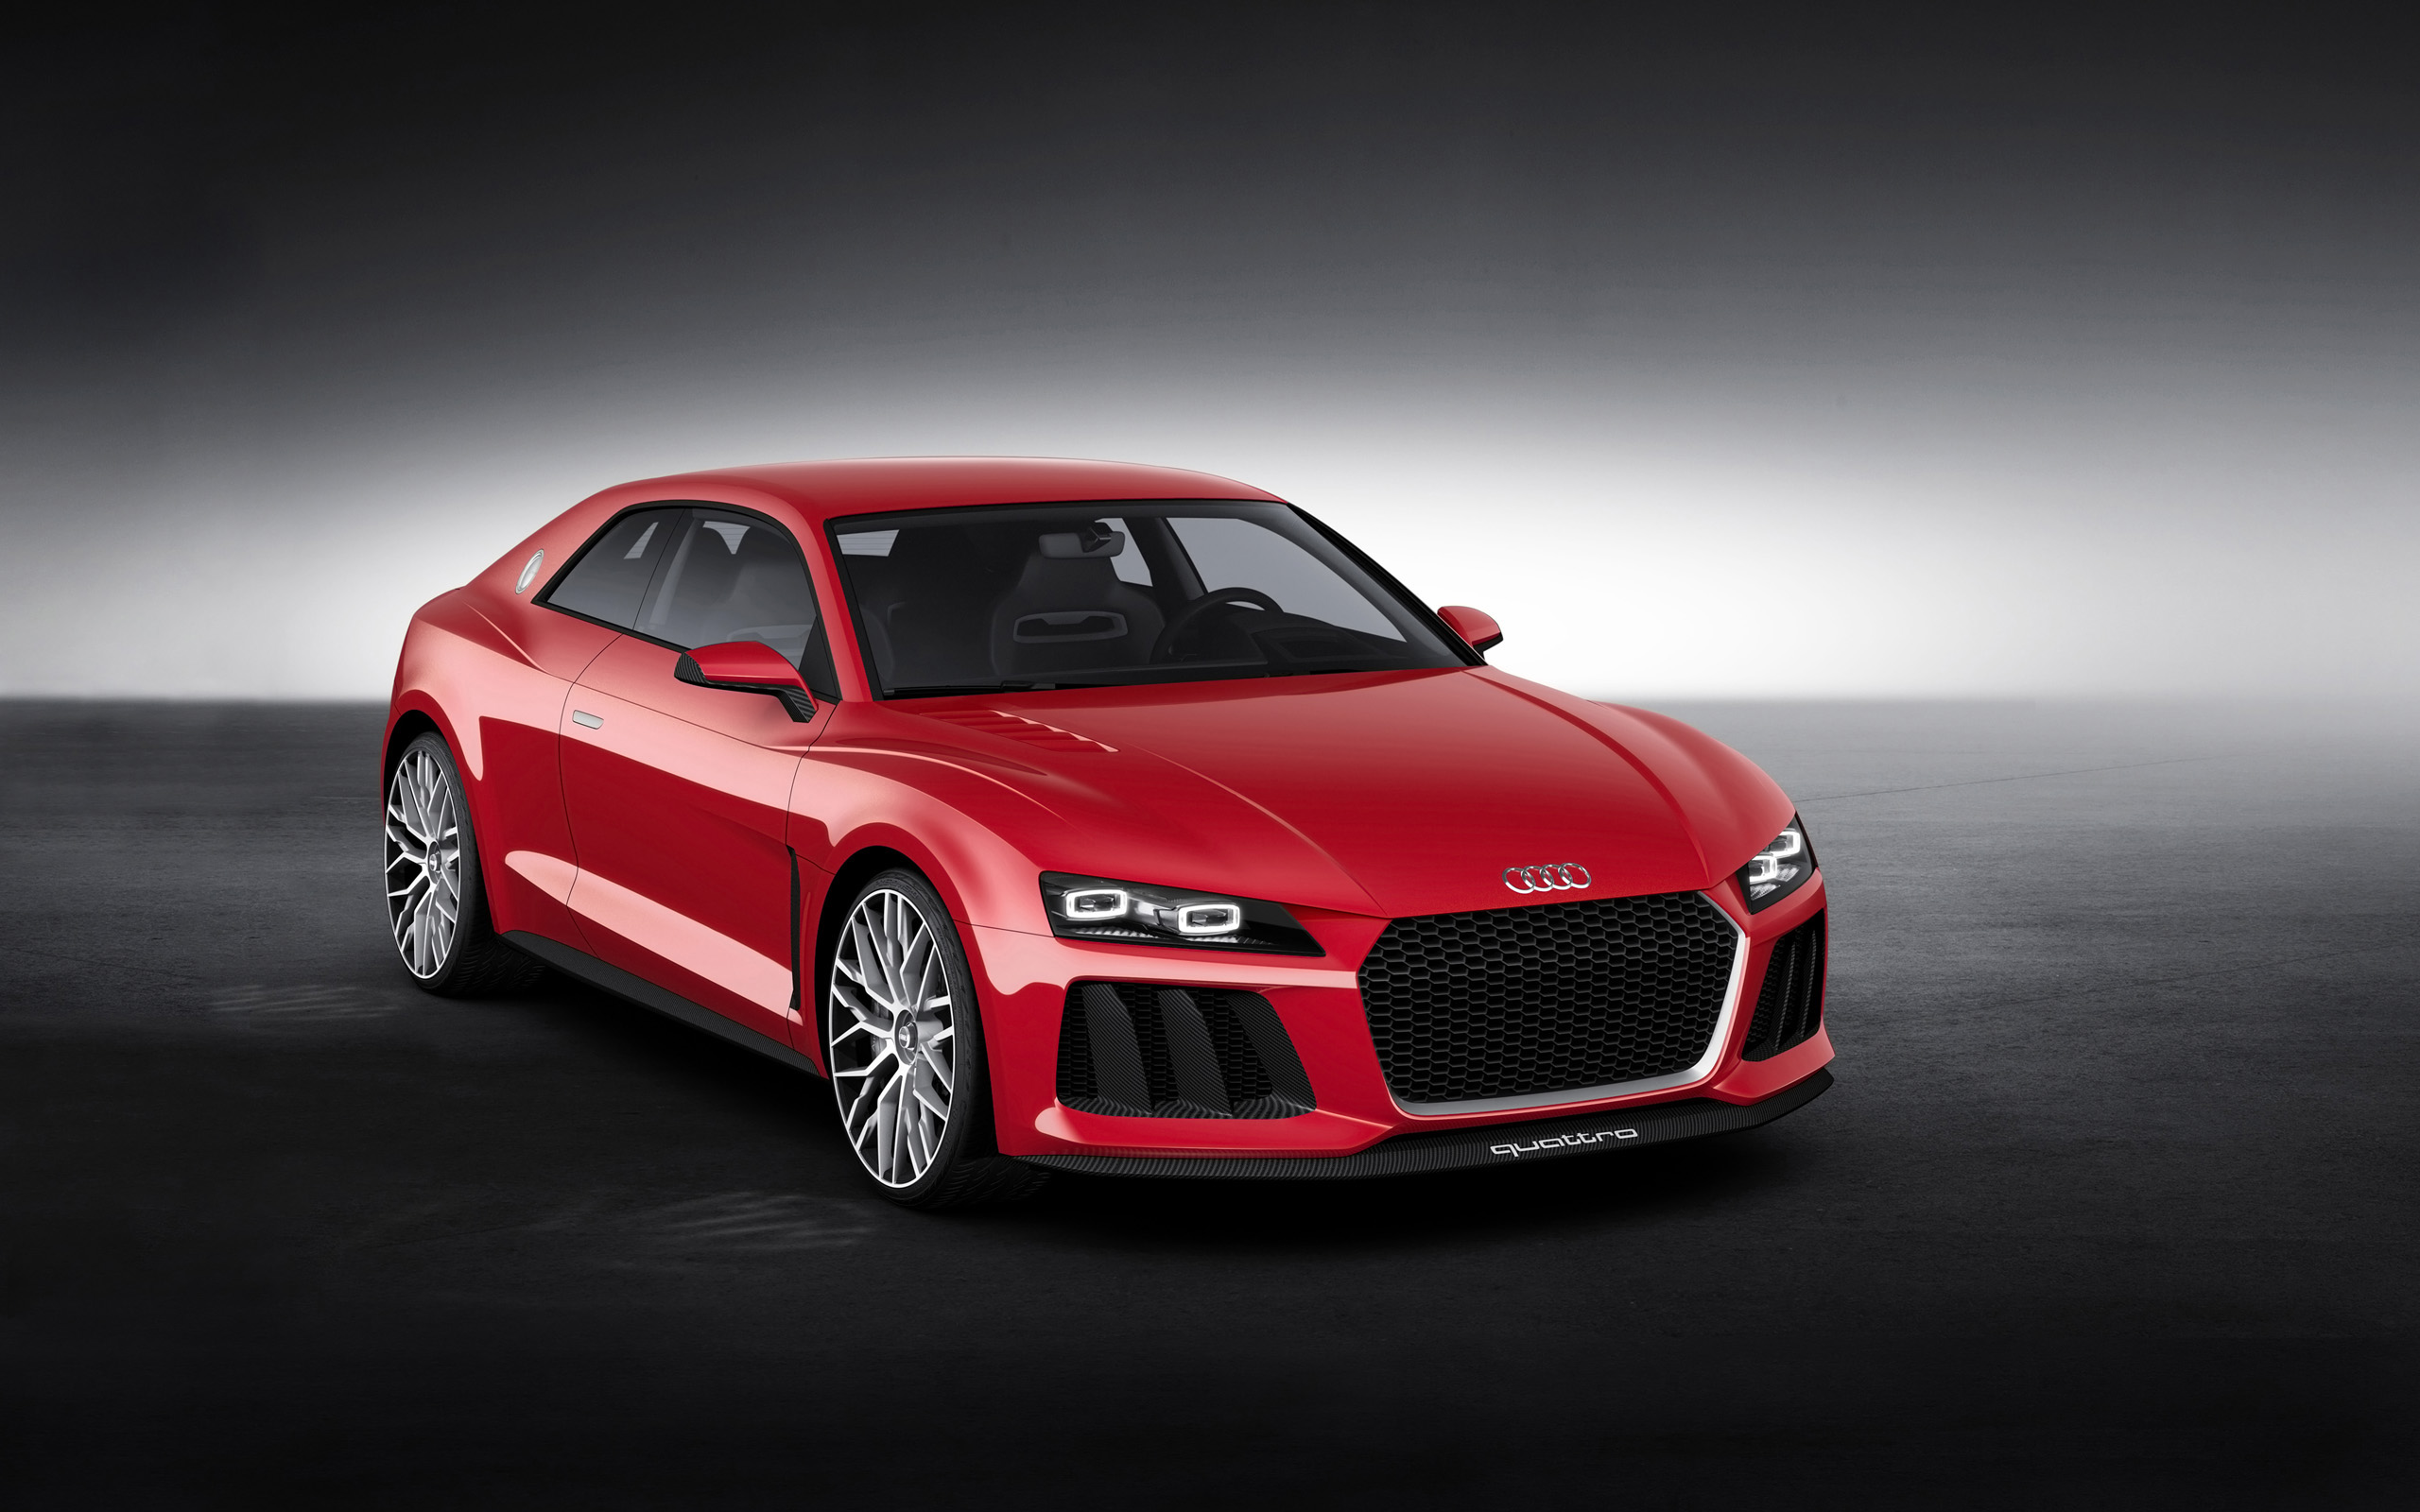 Attractive 2014 Audi Sport Quattro Laserlight Concept